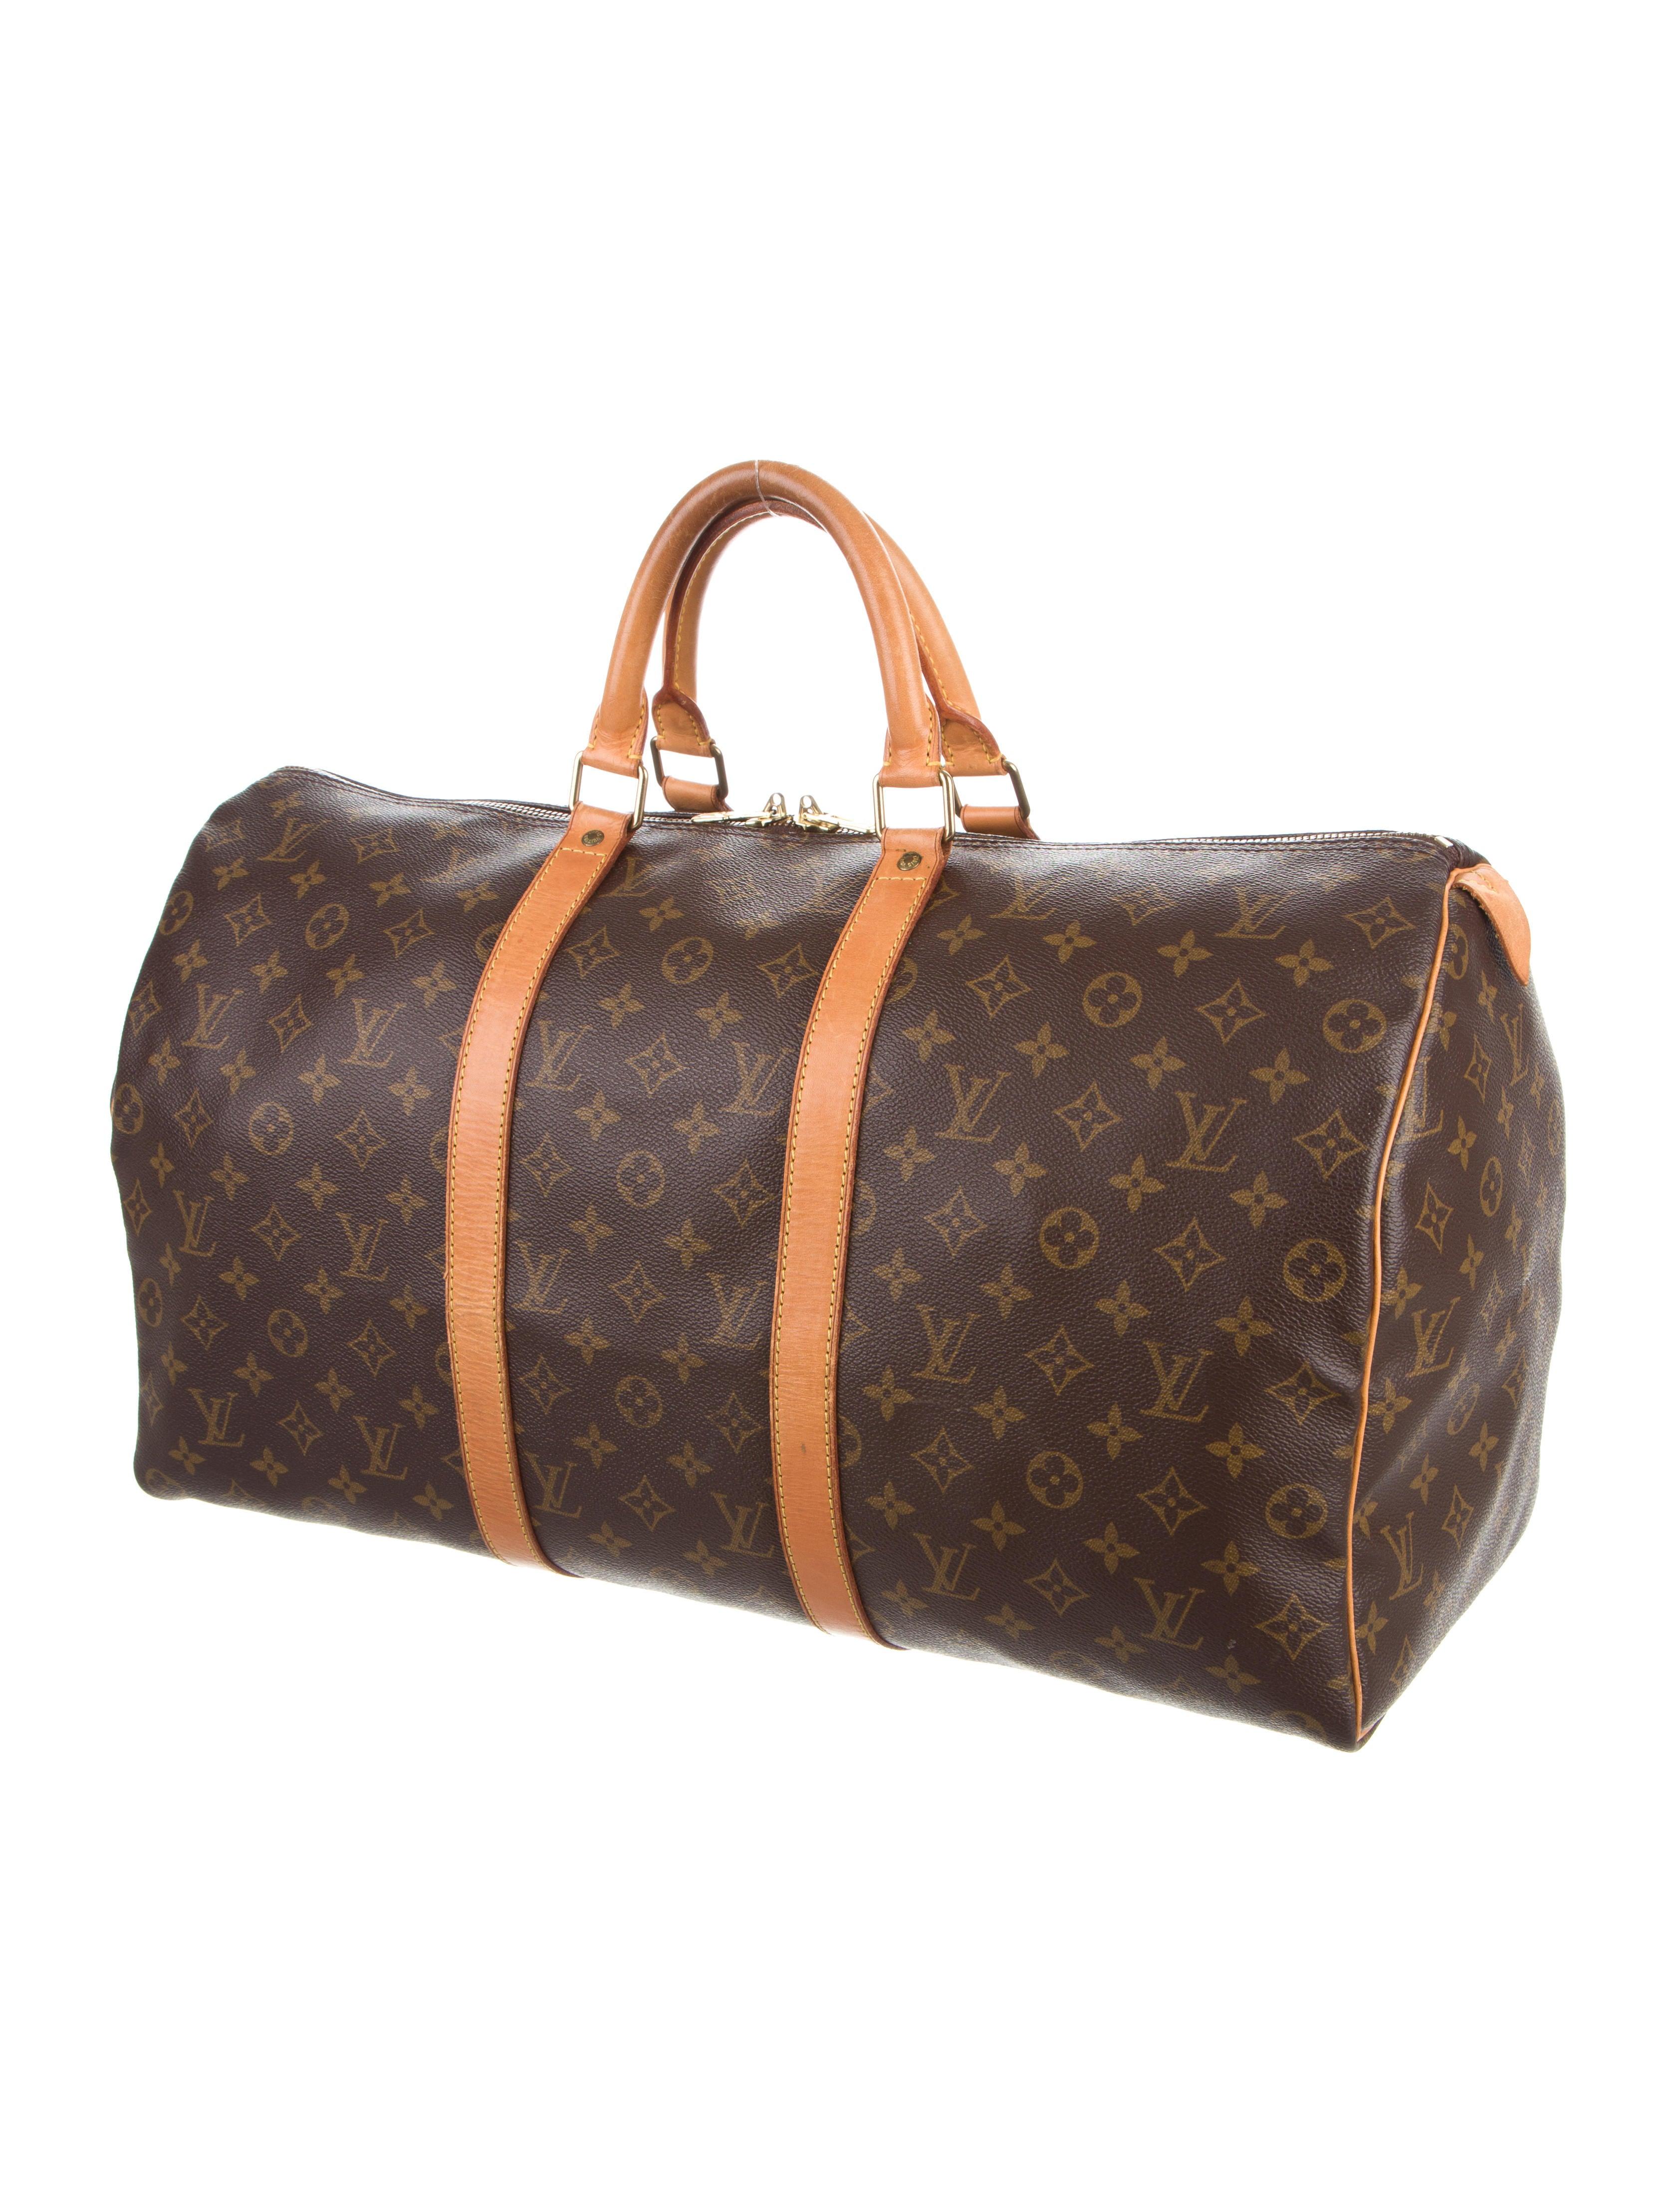 louis vuitton monogram keepall 50 handbags lou121238. Black Bedroom Furniture Sets. Home Design Ideas